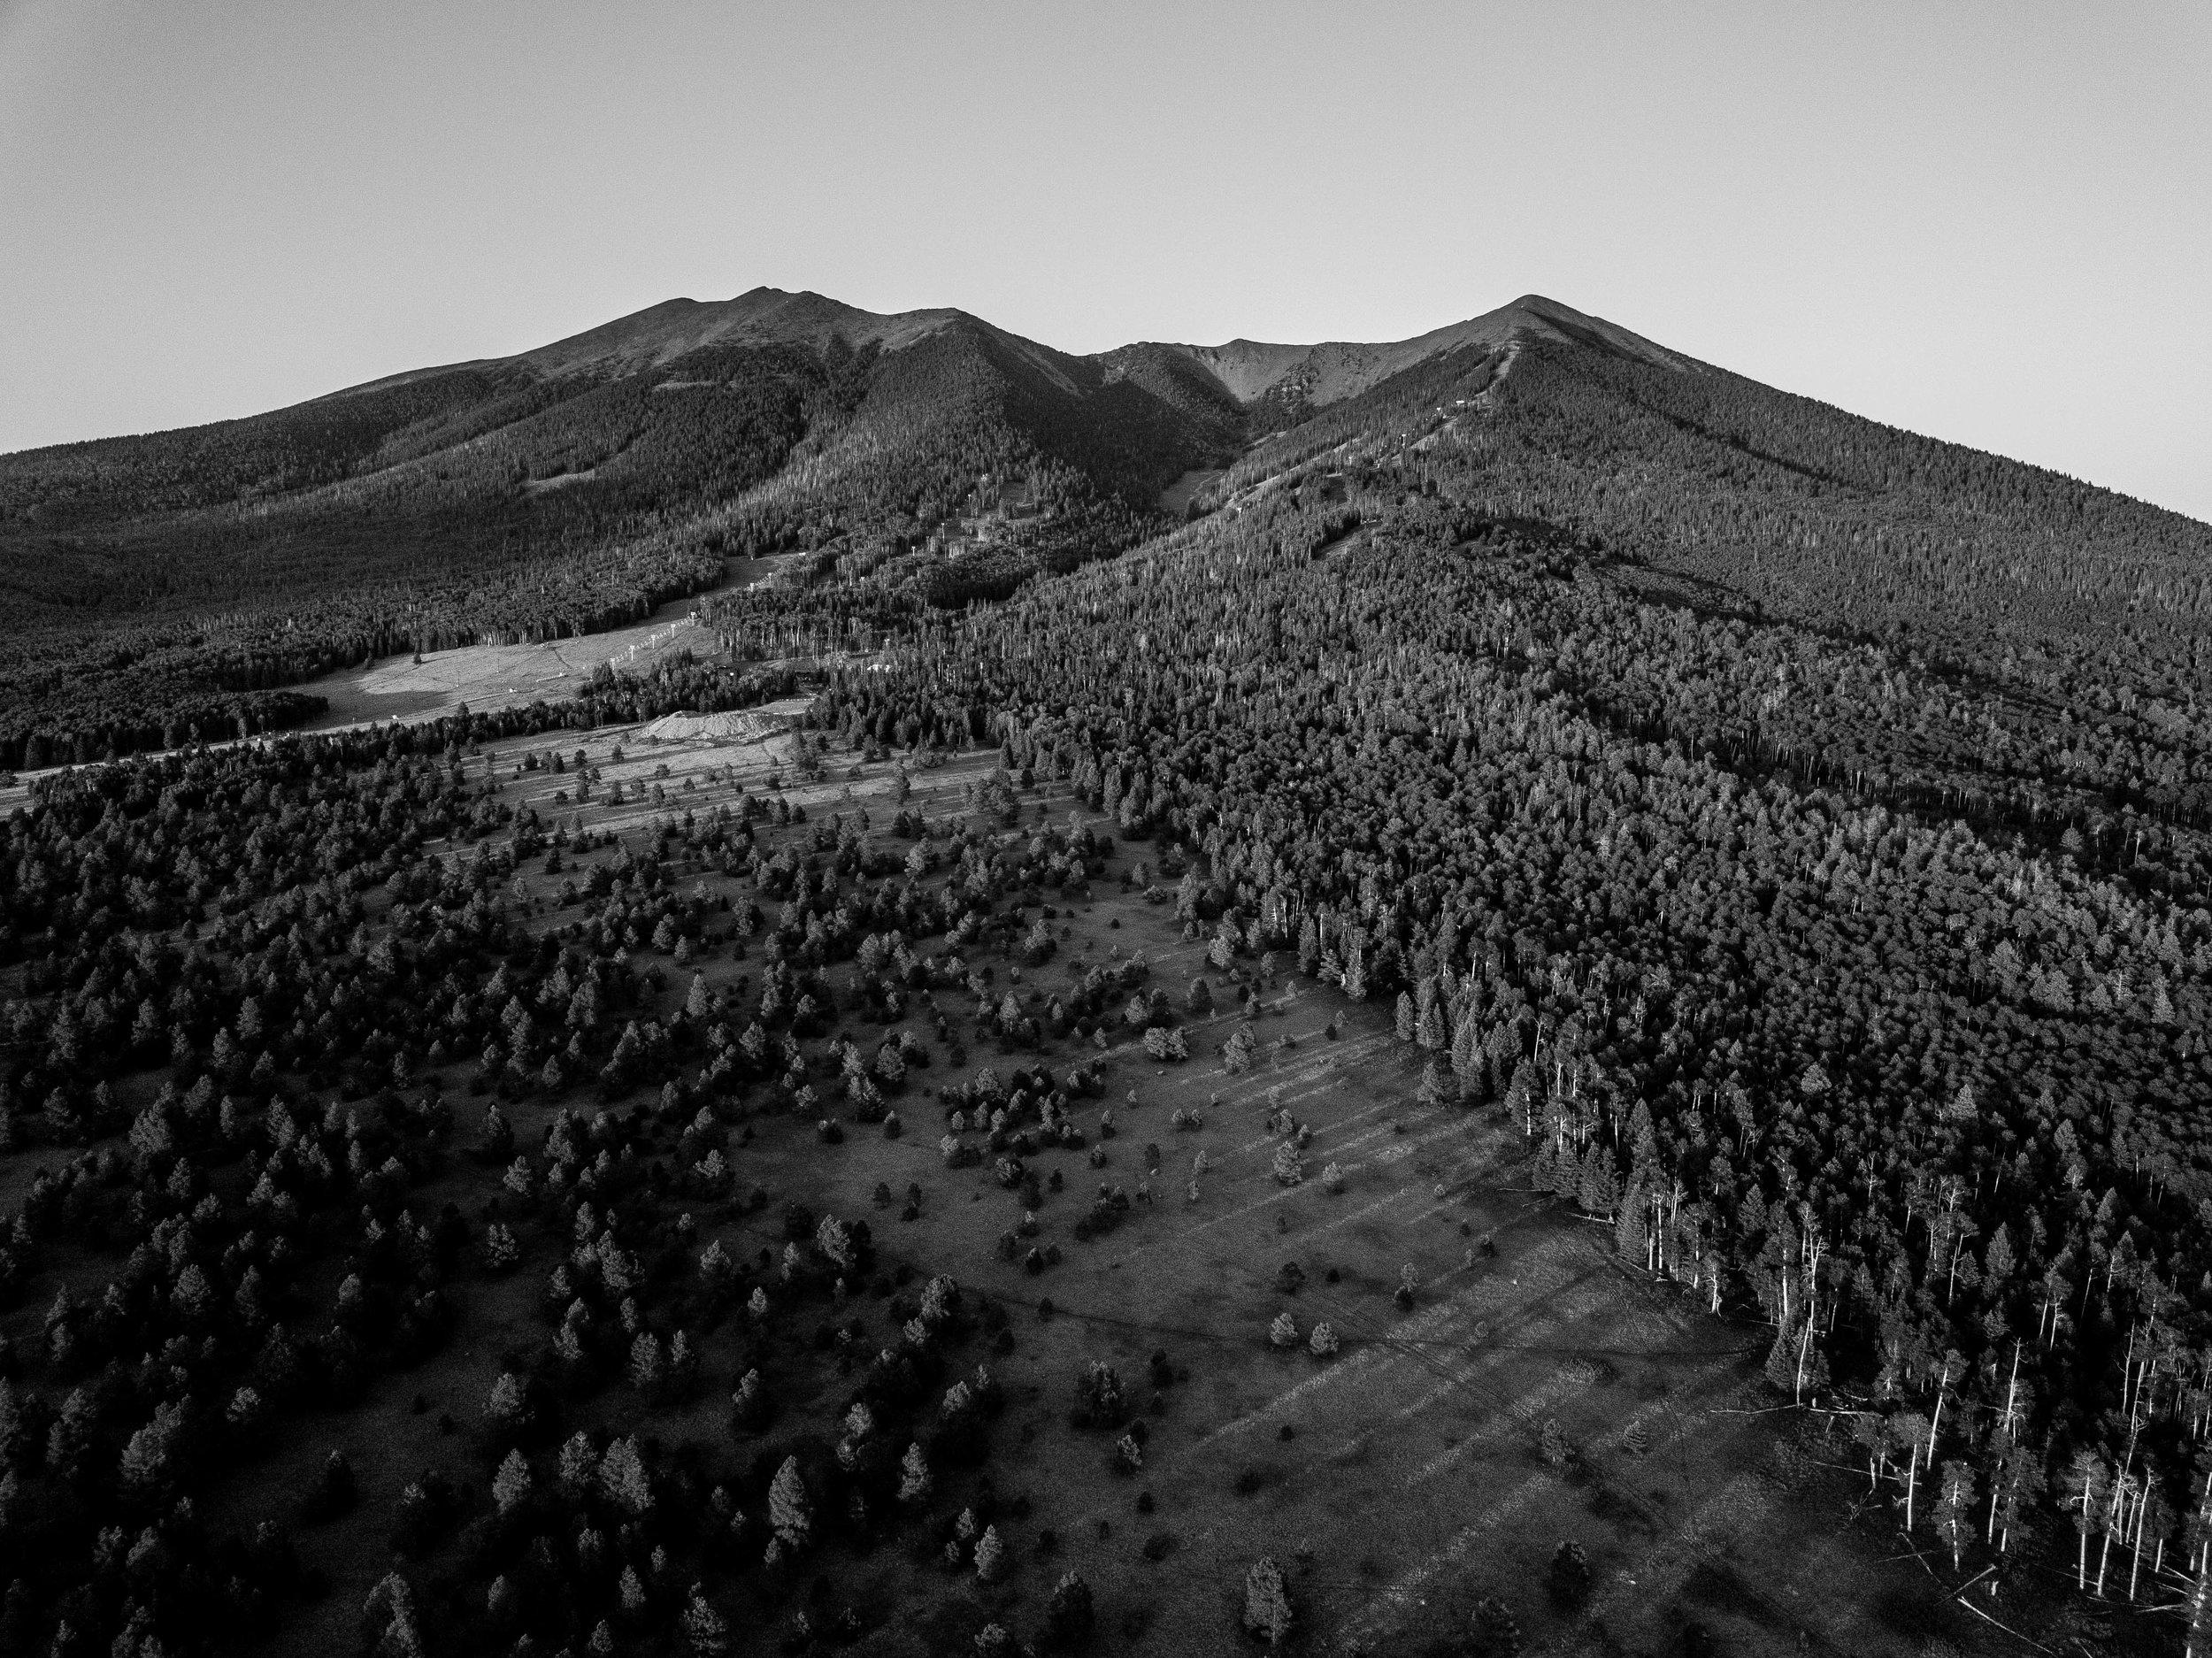 The Peaks from the west side, near alfa fia tank.